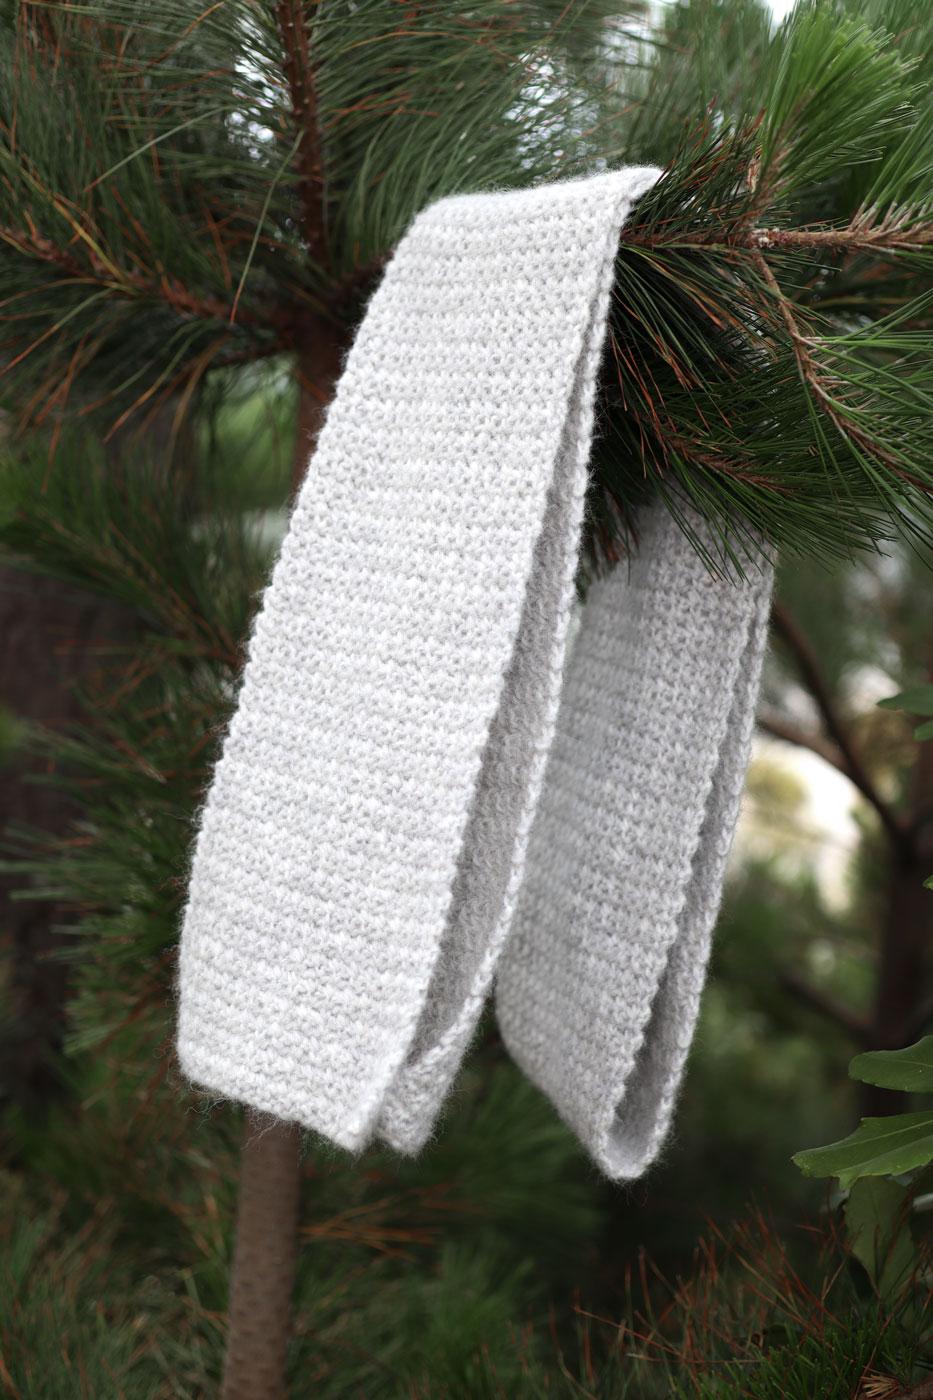 beginner crochet scarf pattern hanging on pine tree branch